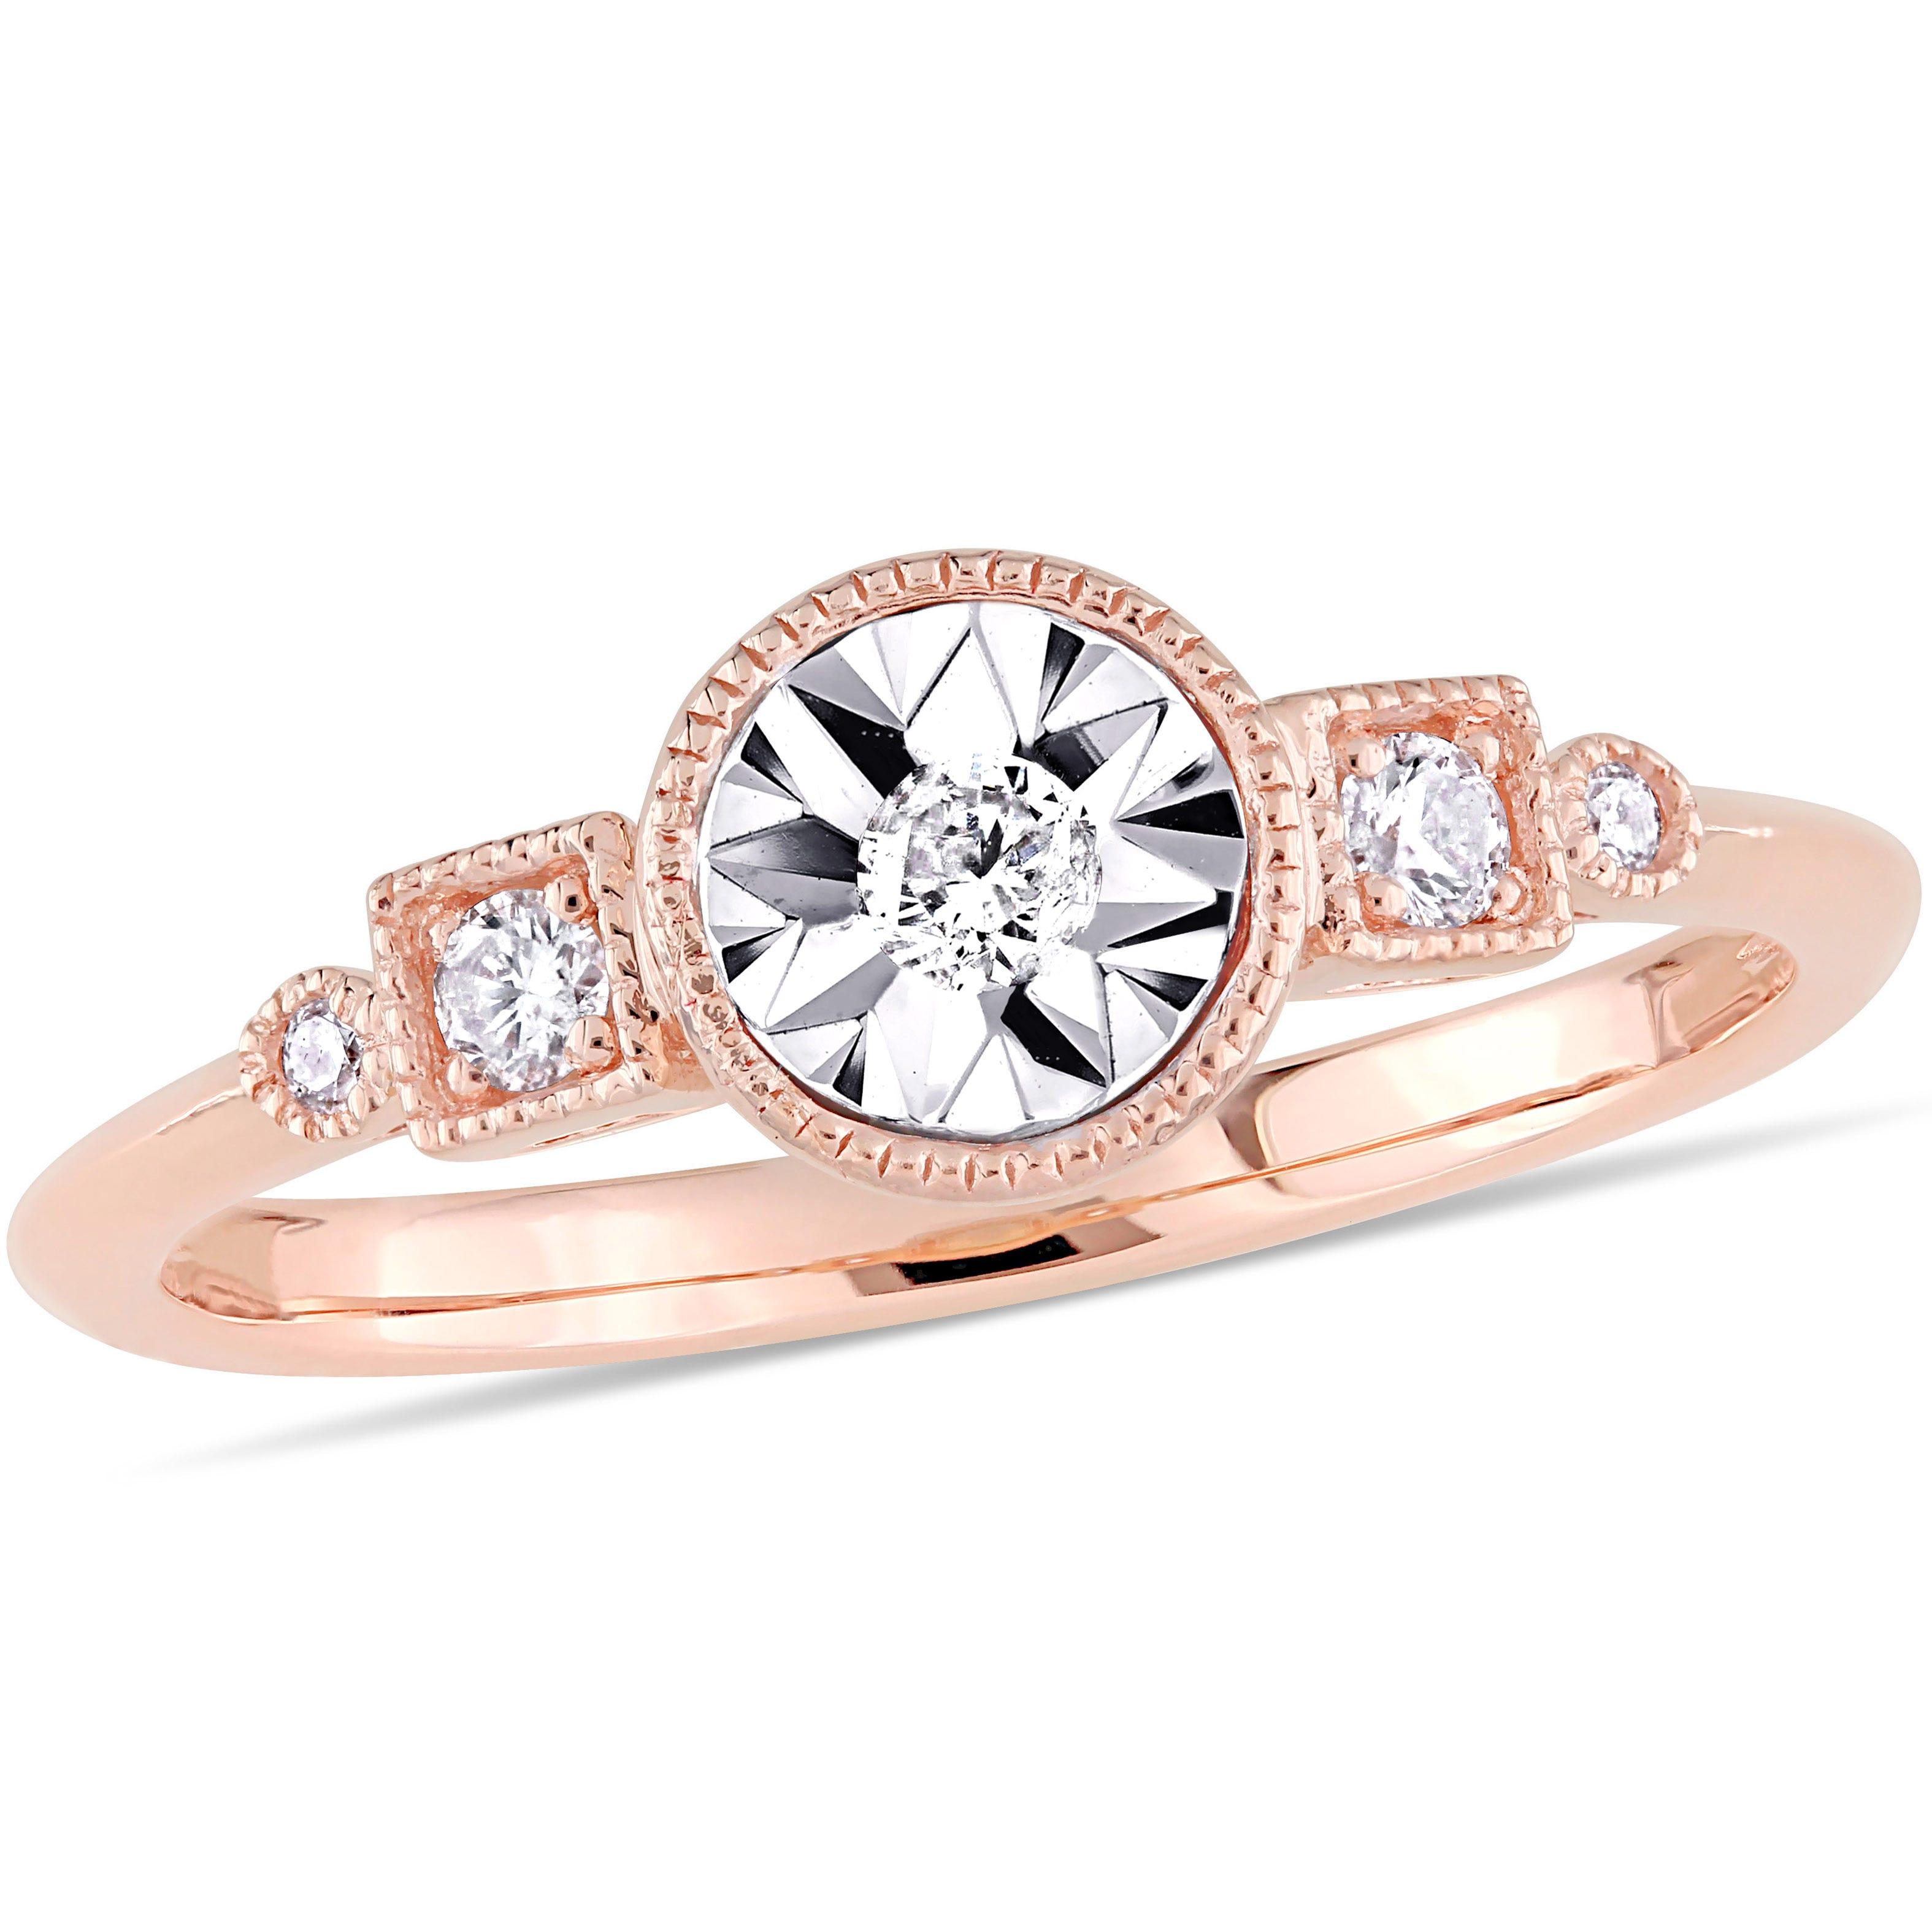 Diamond Engagement Ring 1/7ctw. in 10k Rose Gold